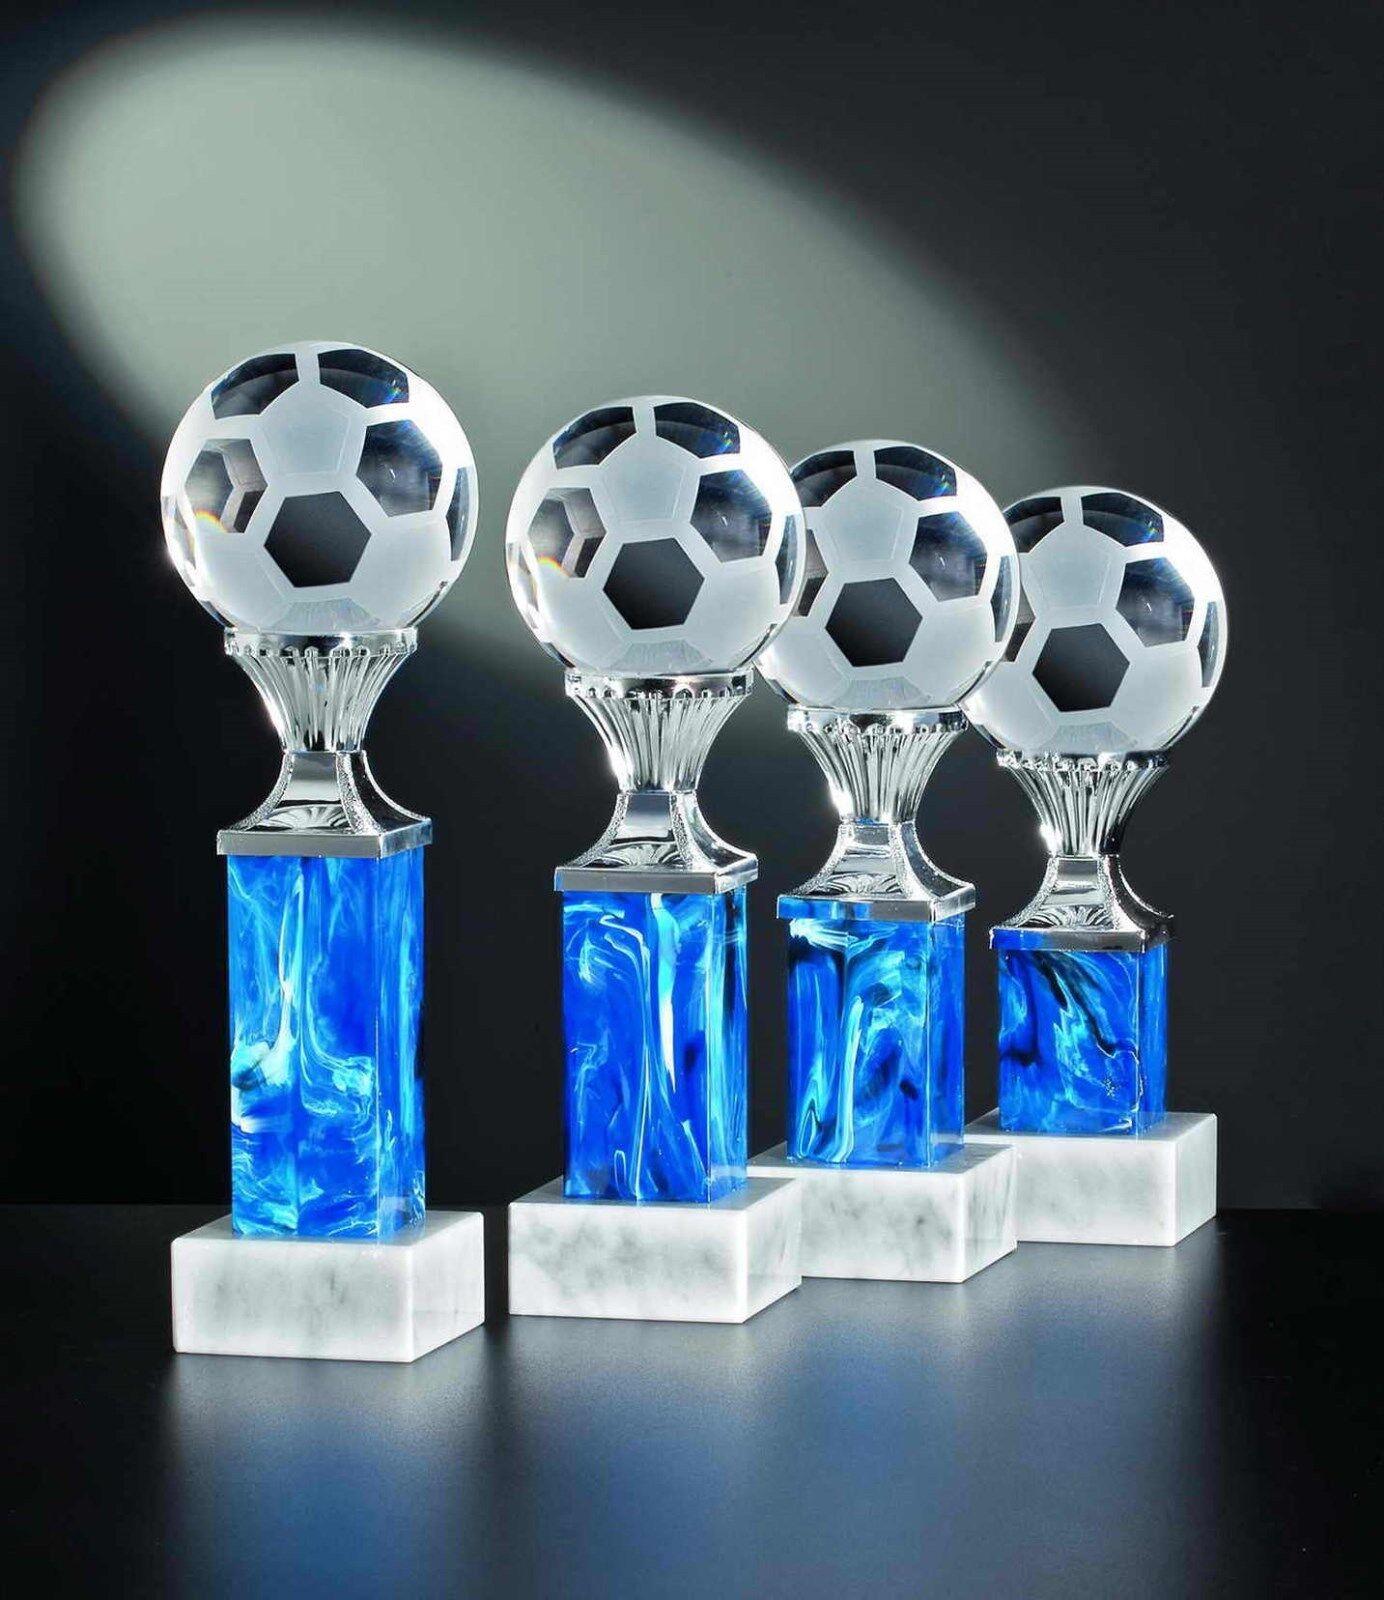 3 glaspokale fútbol noblesseglas 25 22 20cm con grabado  1 (glaspokal vencedor)